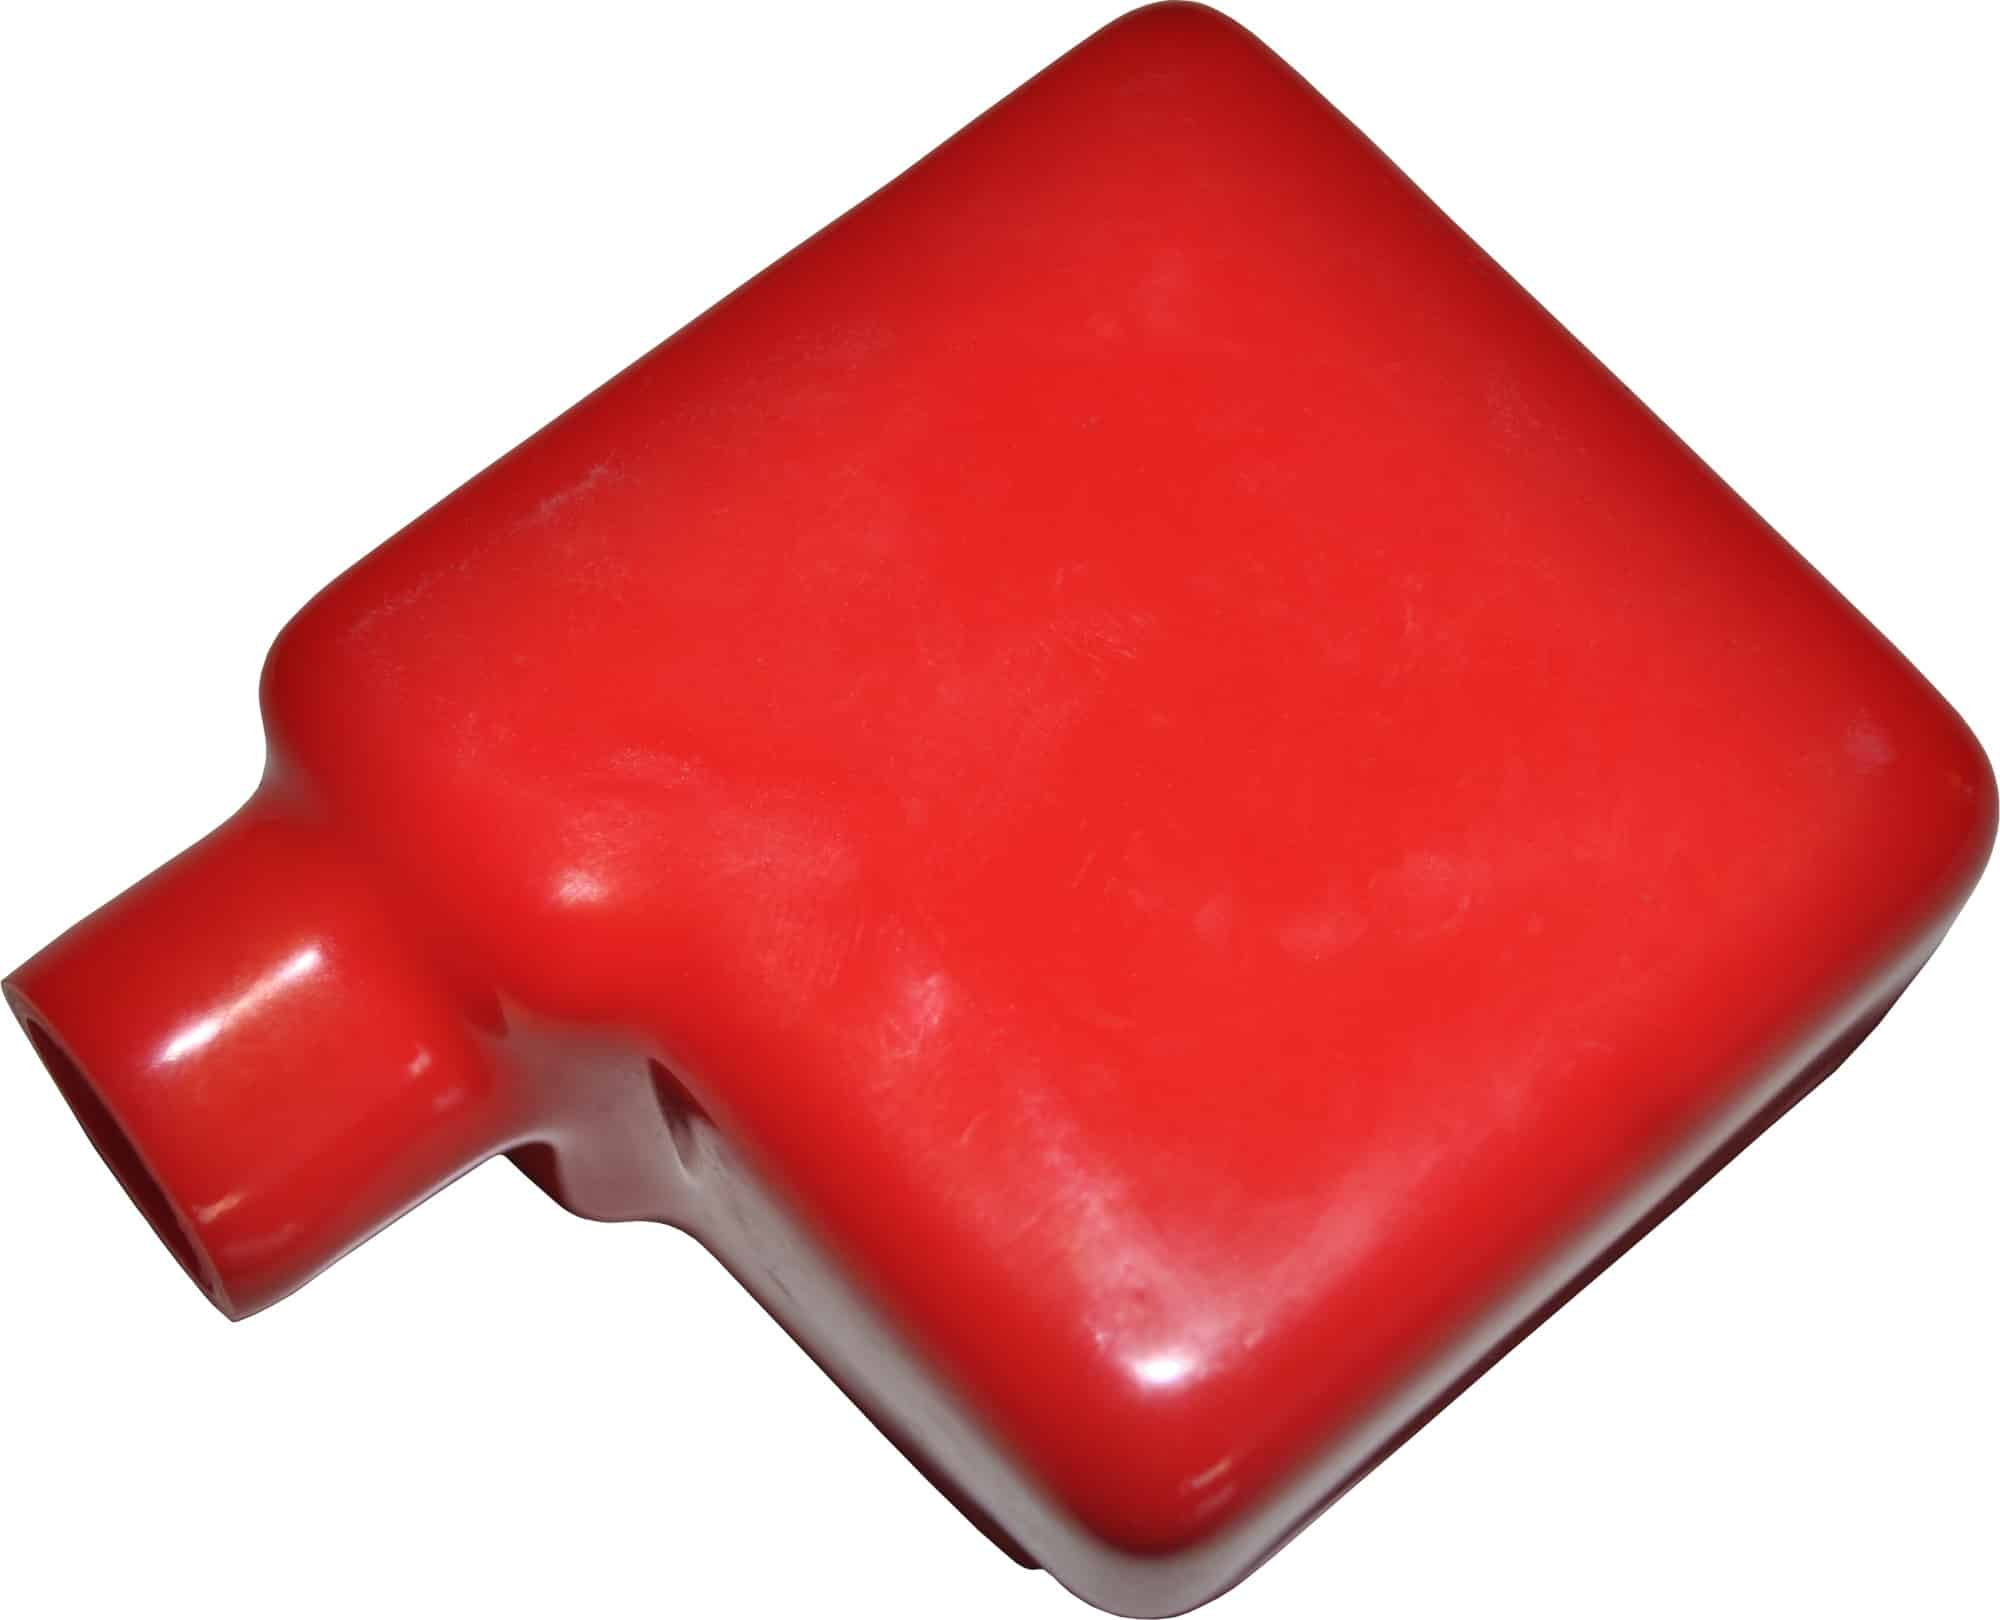 Kappe hætte beskytter til batteri polsko batteripol rød bil lastbil motorcykel scooter traktor camping beskyttelseskappe støvkappe 020295R RACO